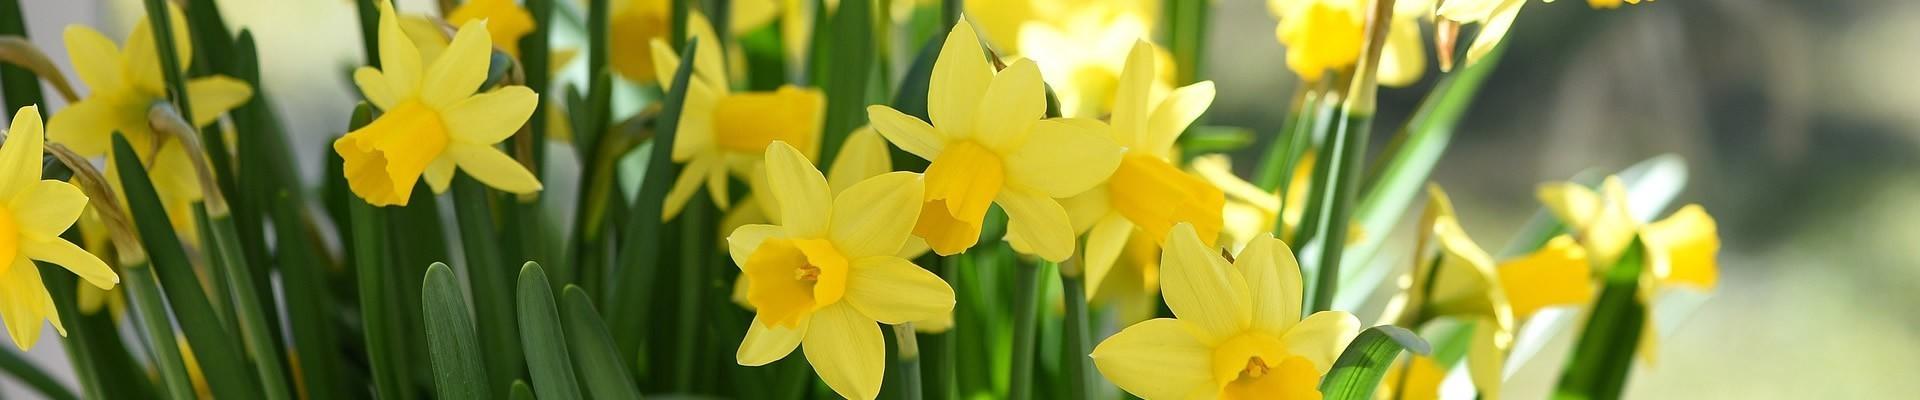 Miniature Daffodil Bulbs